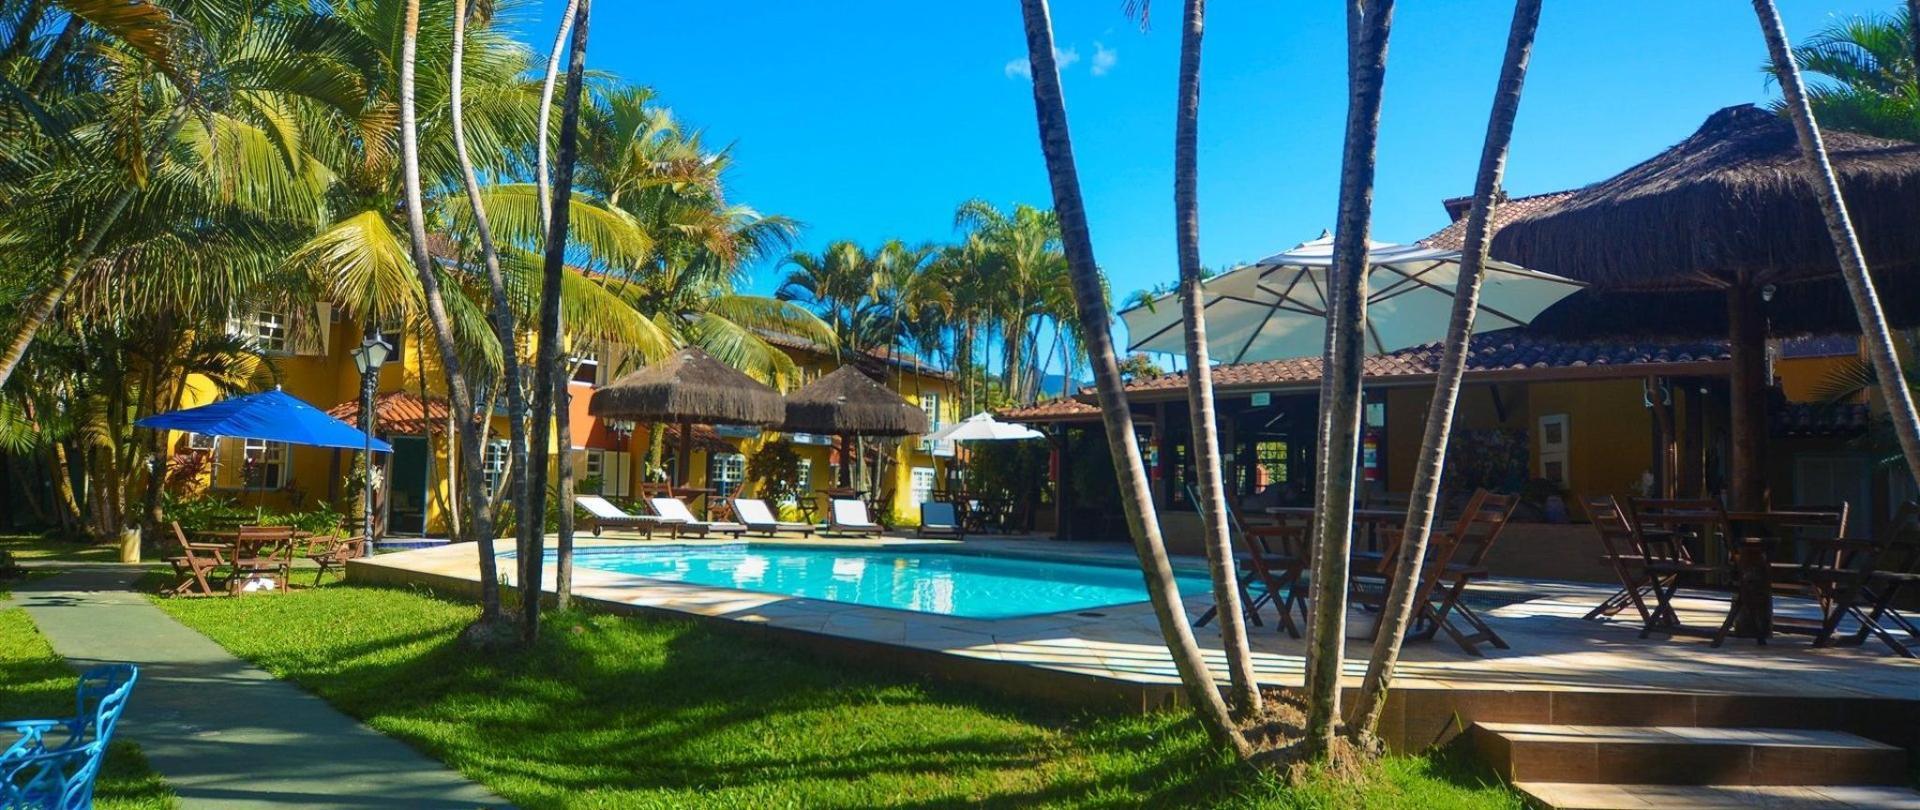 Pousada Villa del Sol - Paraty - Brasil5.jpg